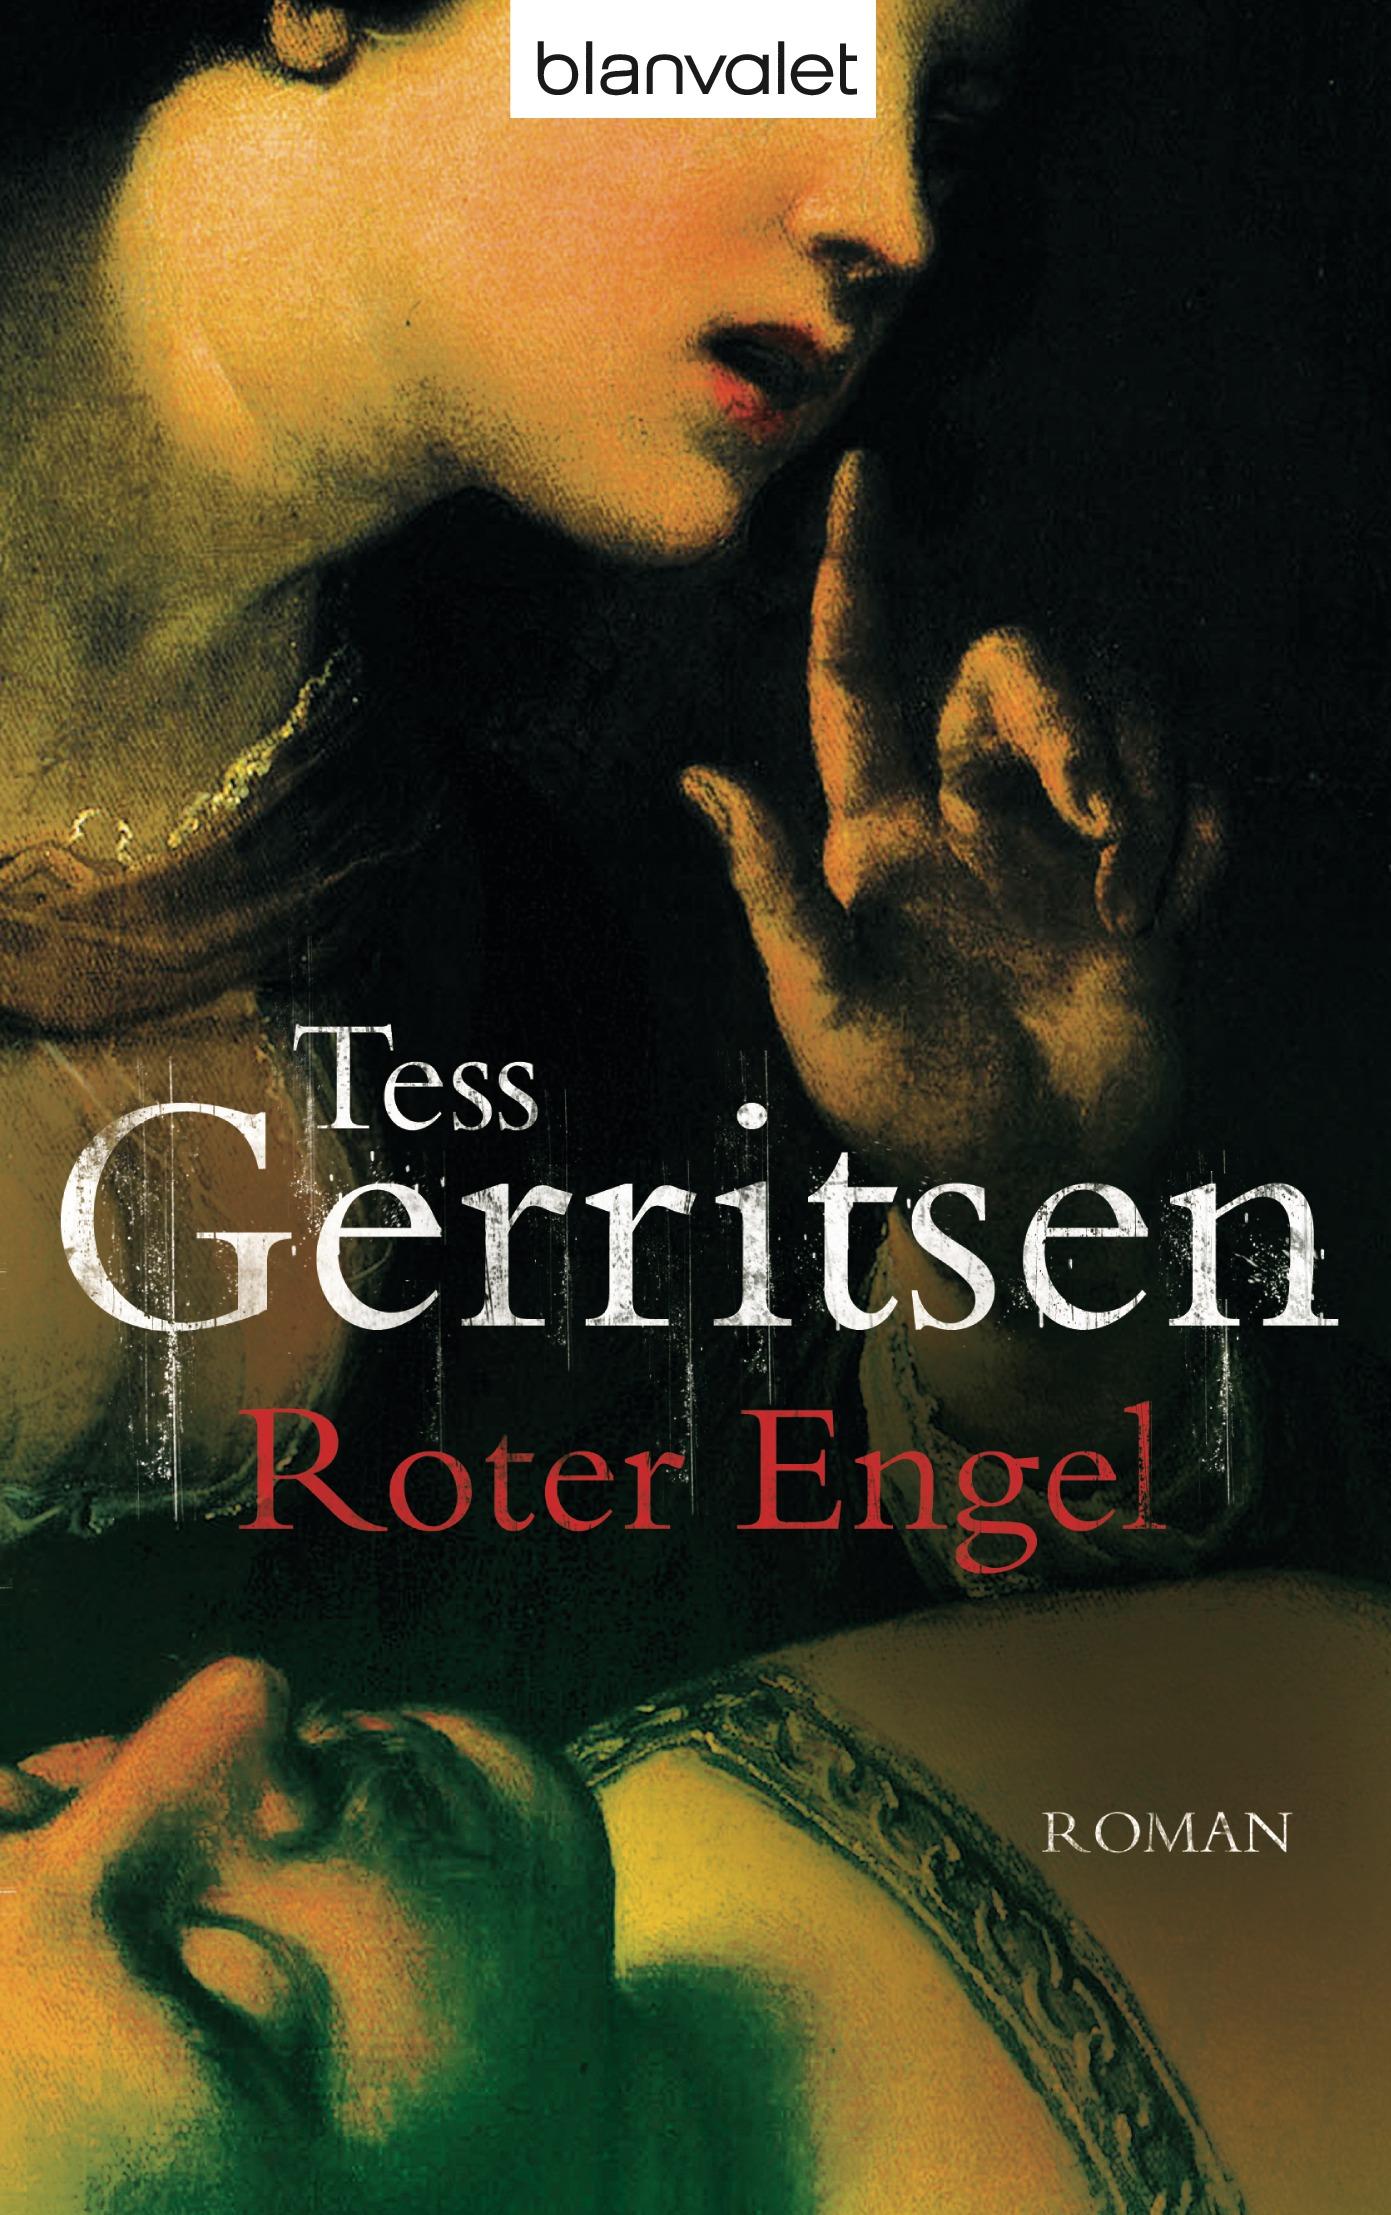 Roter Engel - Tess Gerritsen [Taschenbuch]